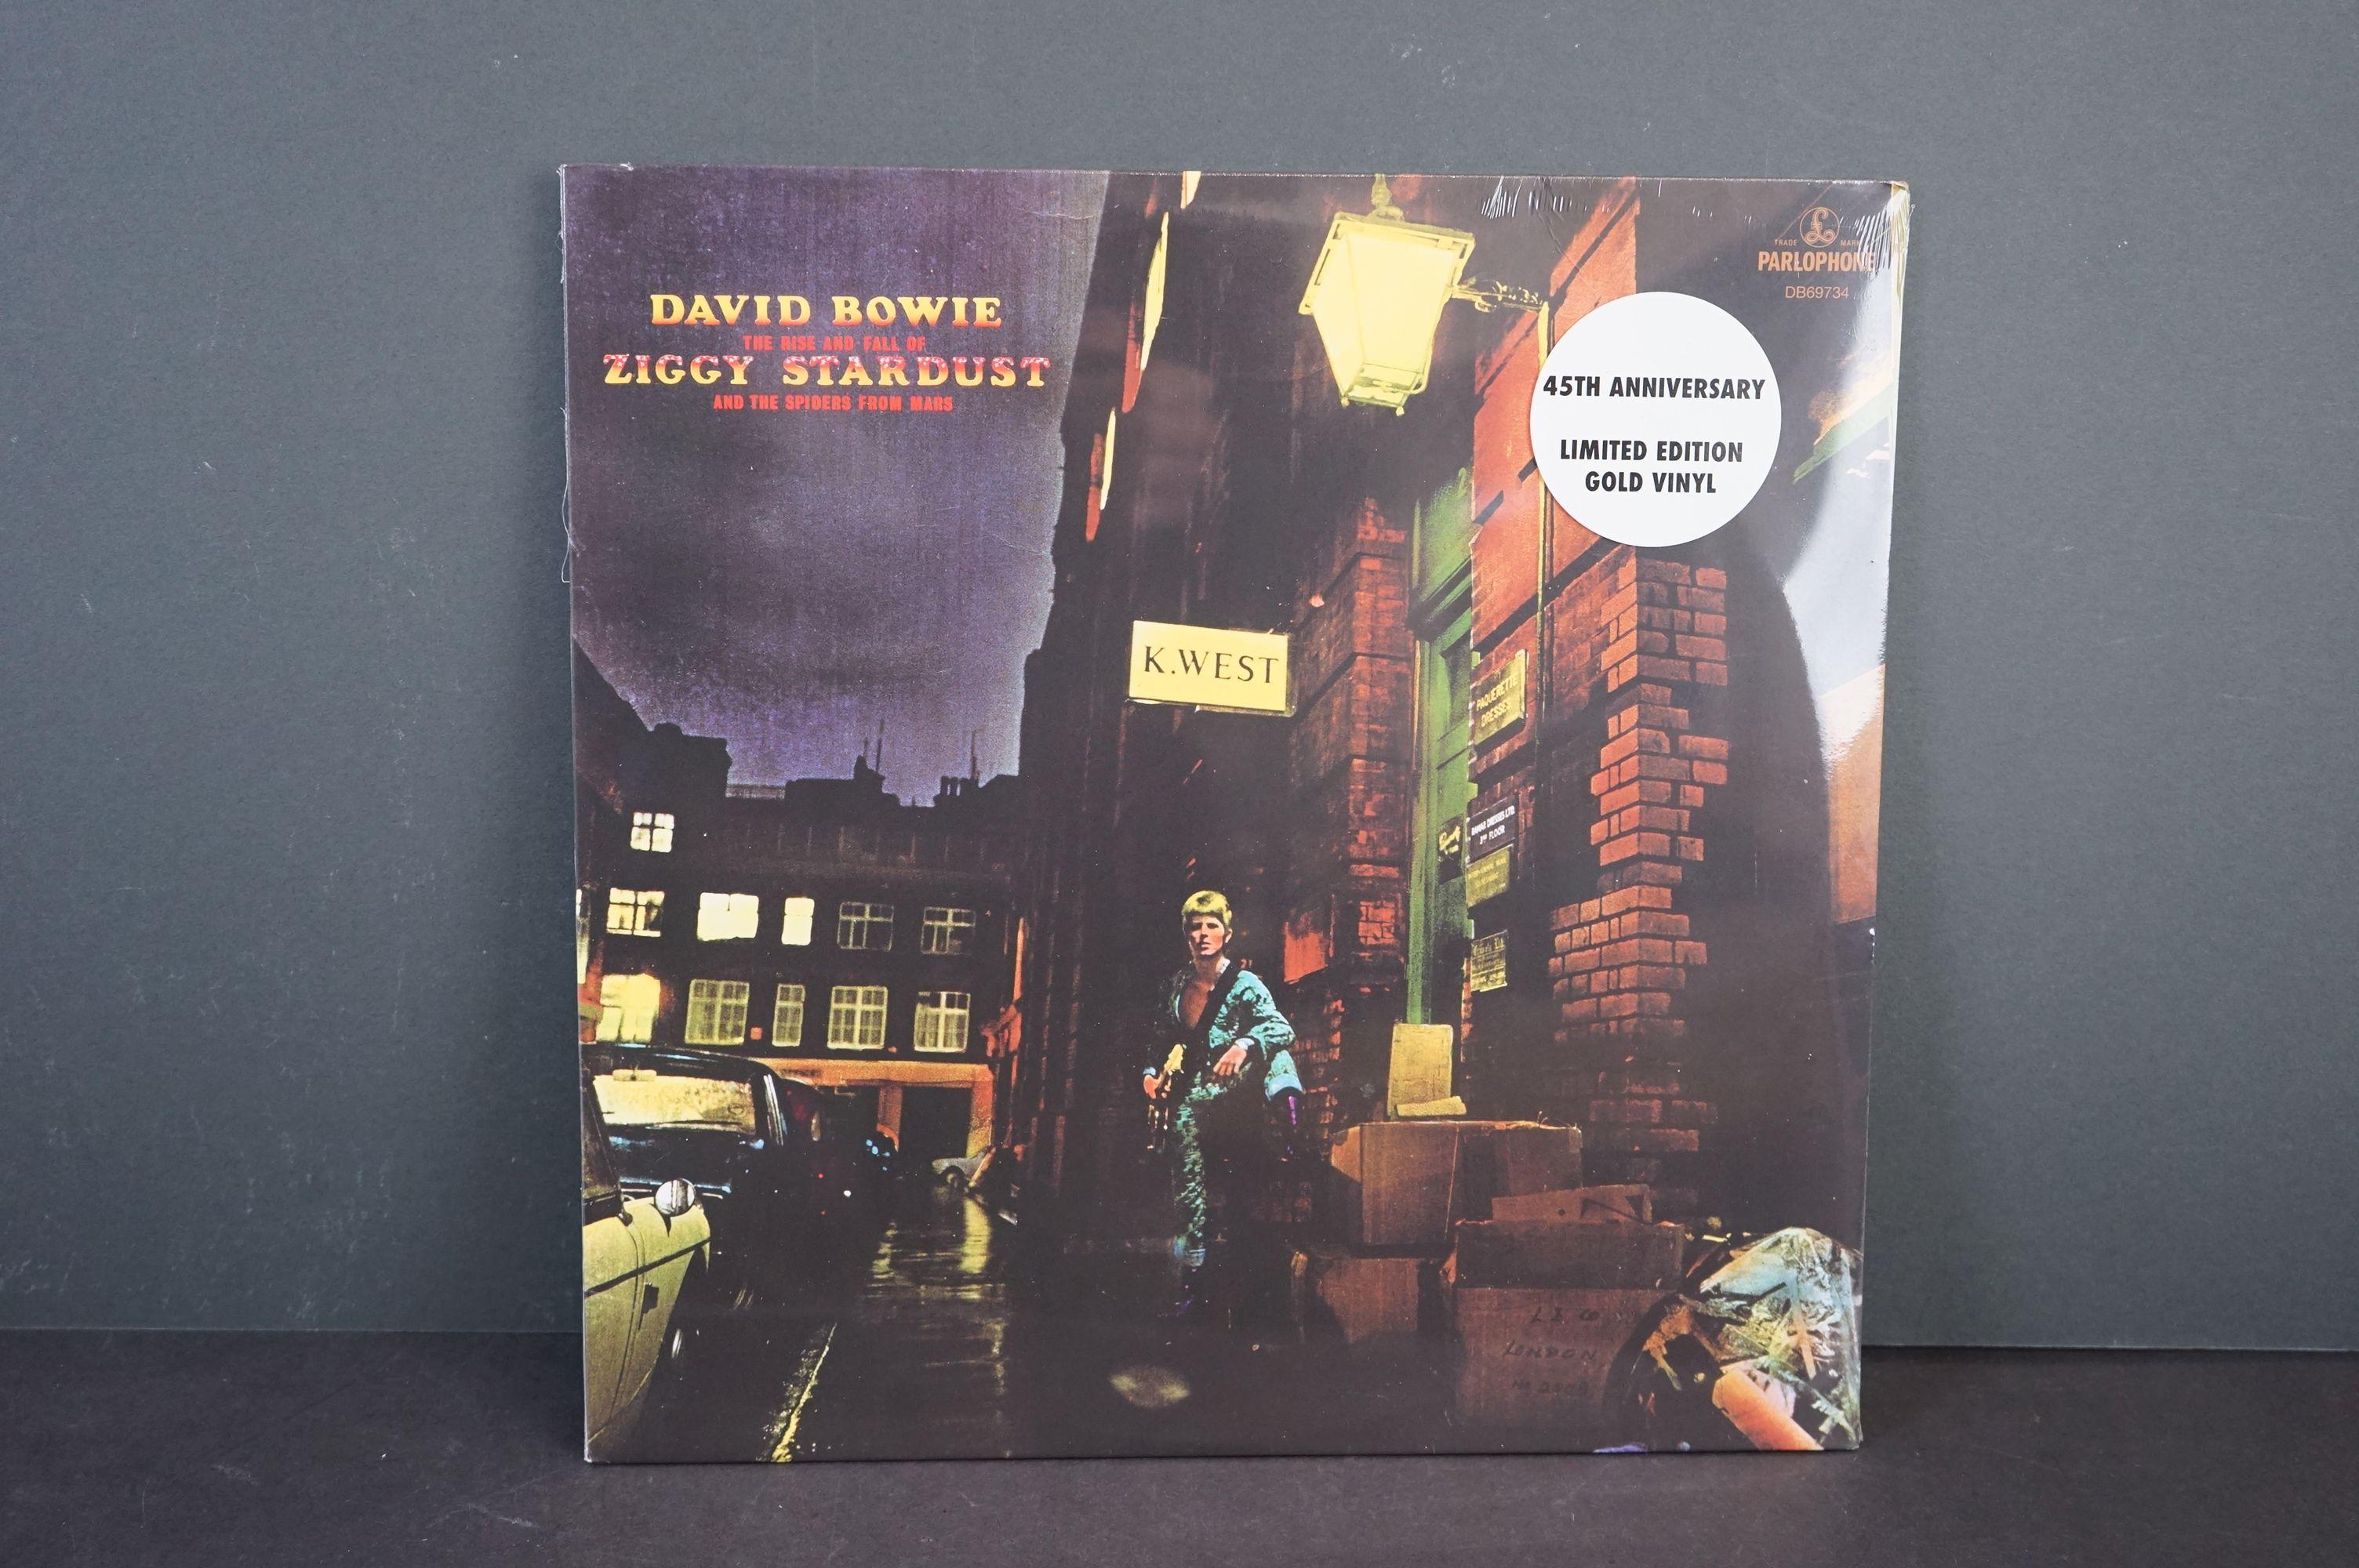 Vinyl - David Bowie Ziggy Stardust and the Spiders from Mars 45th Anniversary ltd edn gold vinyl LP,